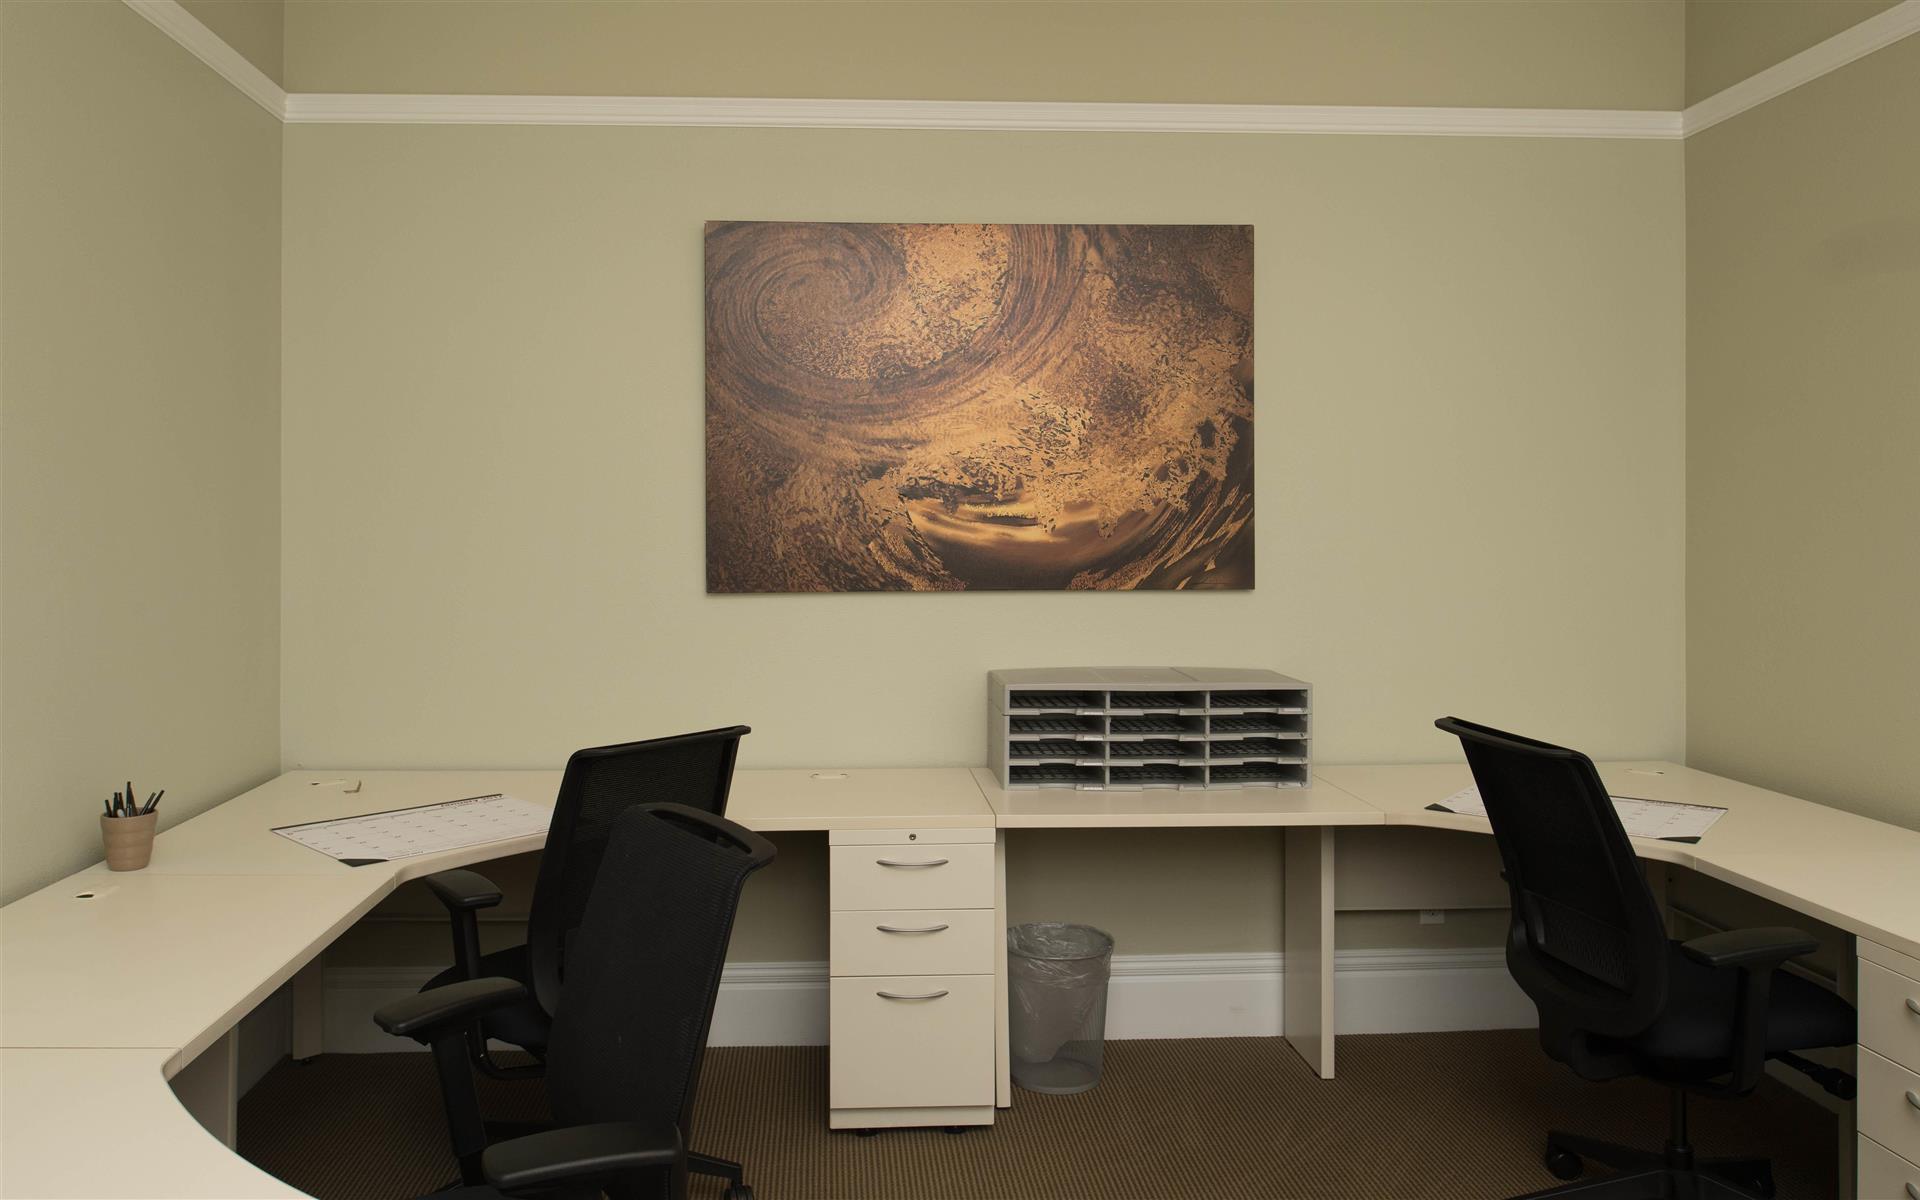 Victory Workspace Danville - Dedicated Desk C in the Green Room